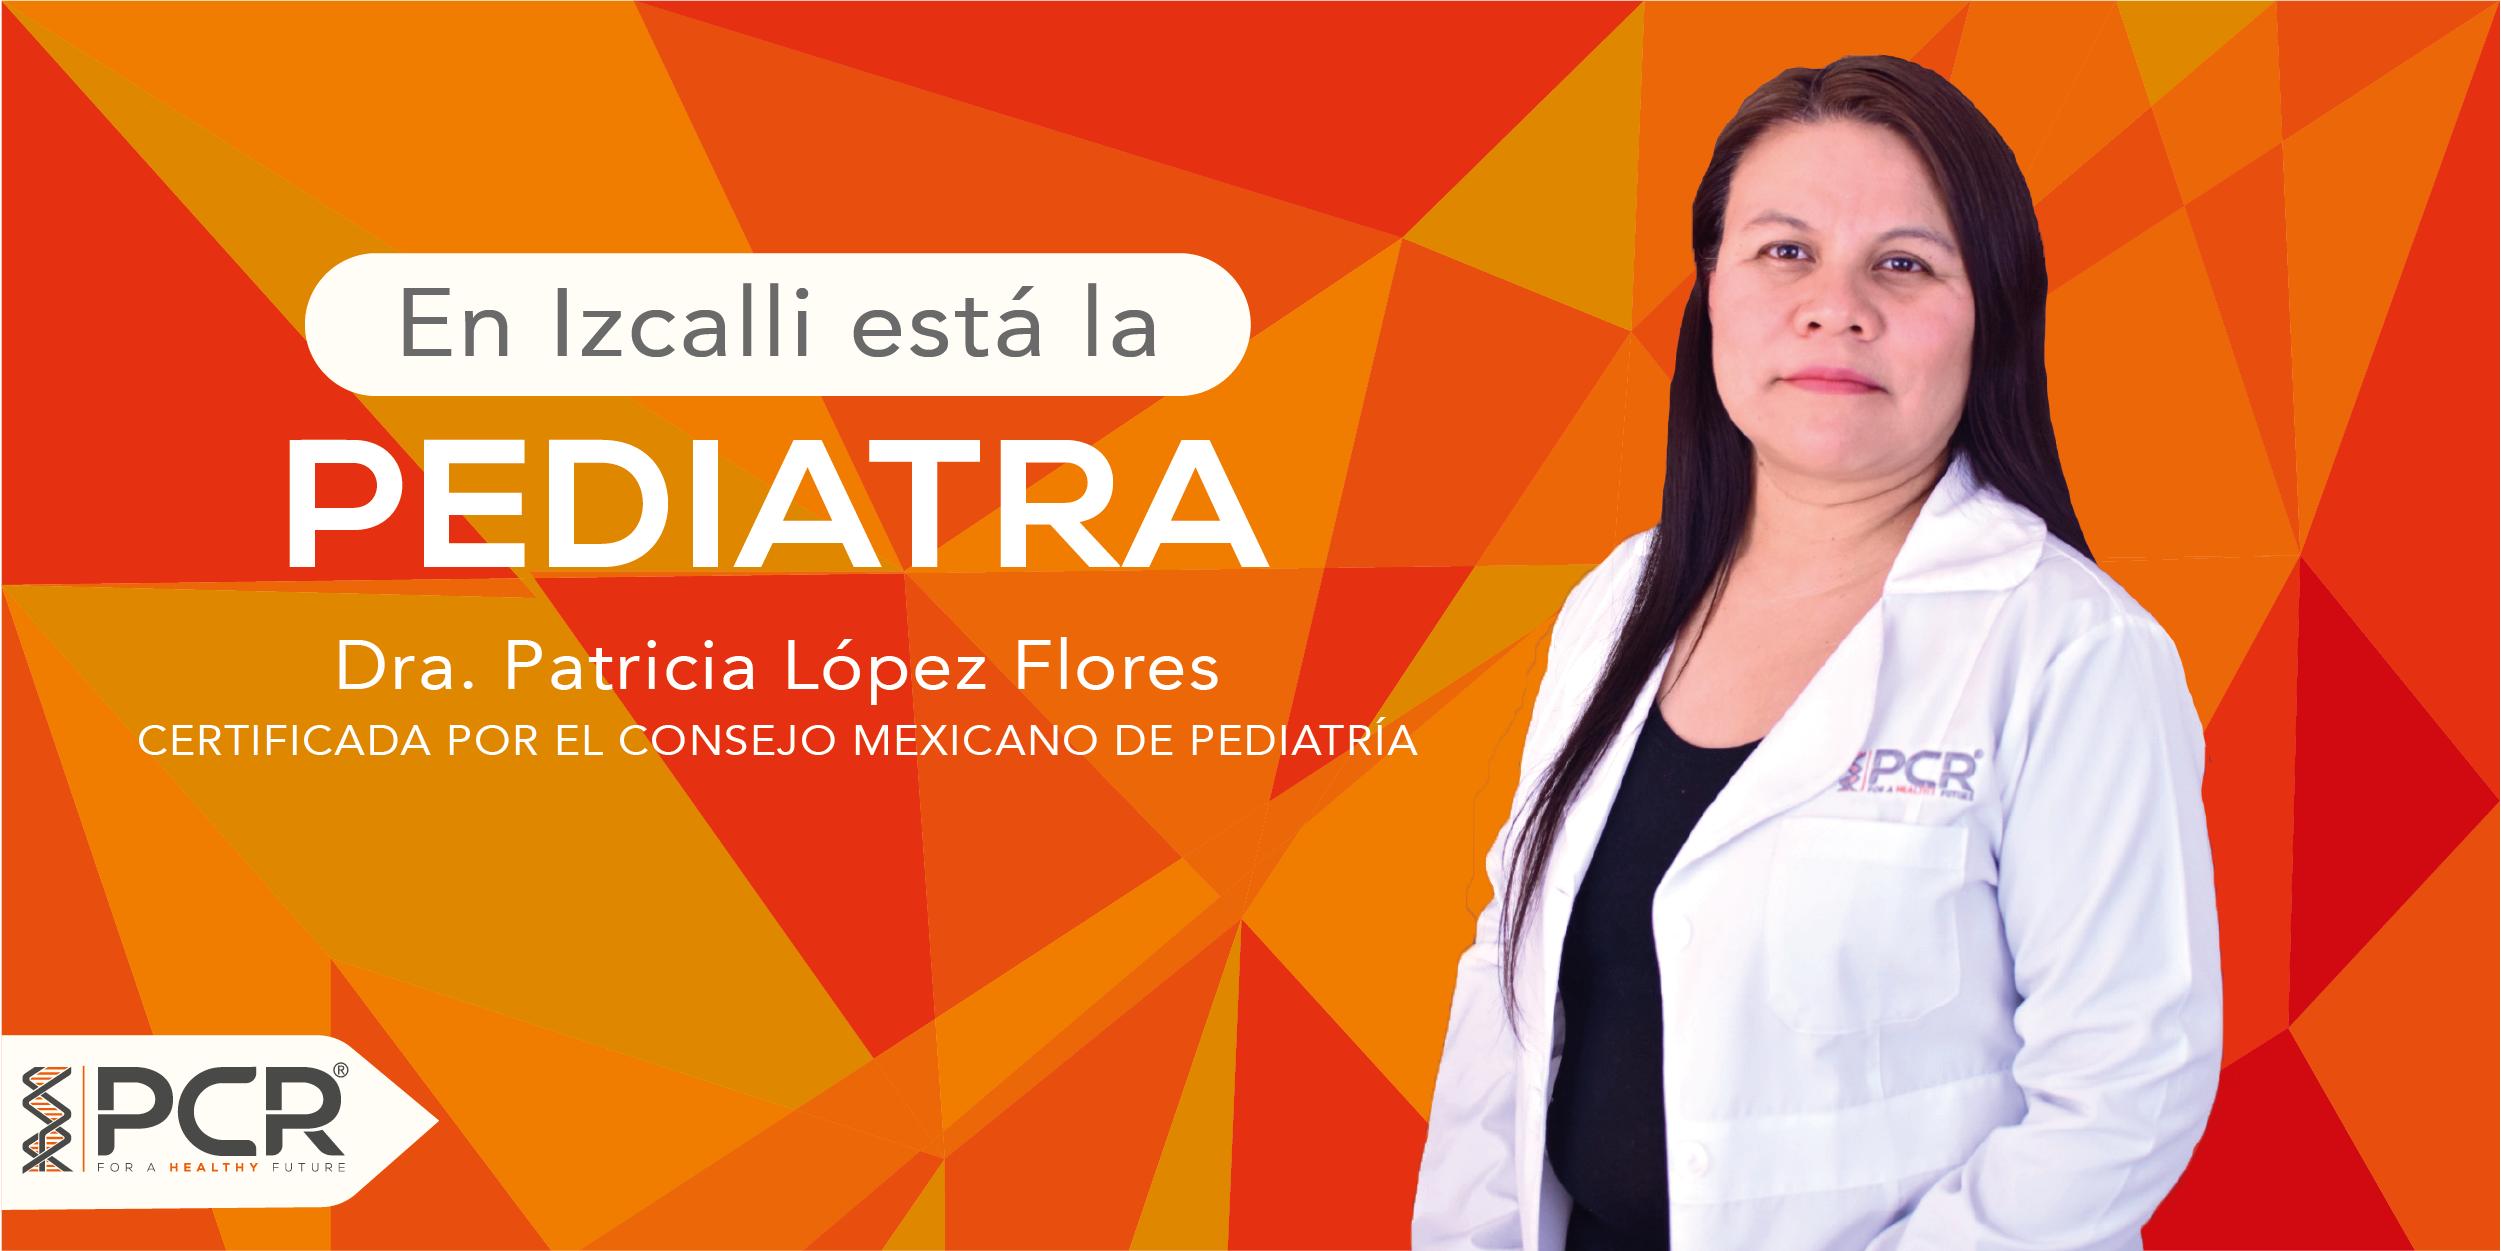 Dra. Patricia López Flores, PEDIATRA.